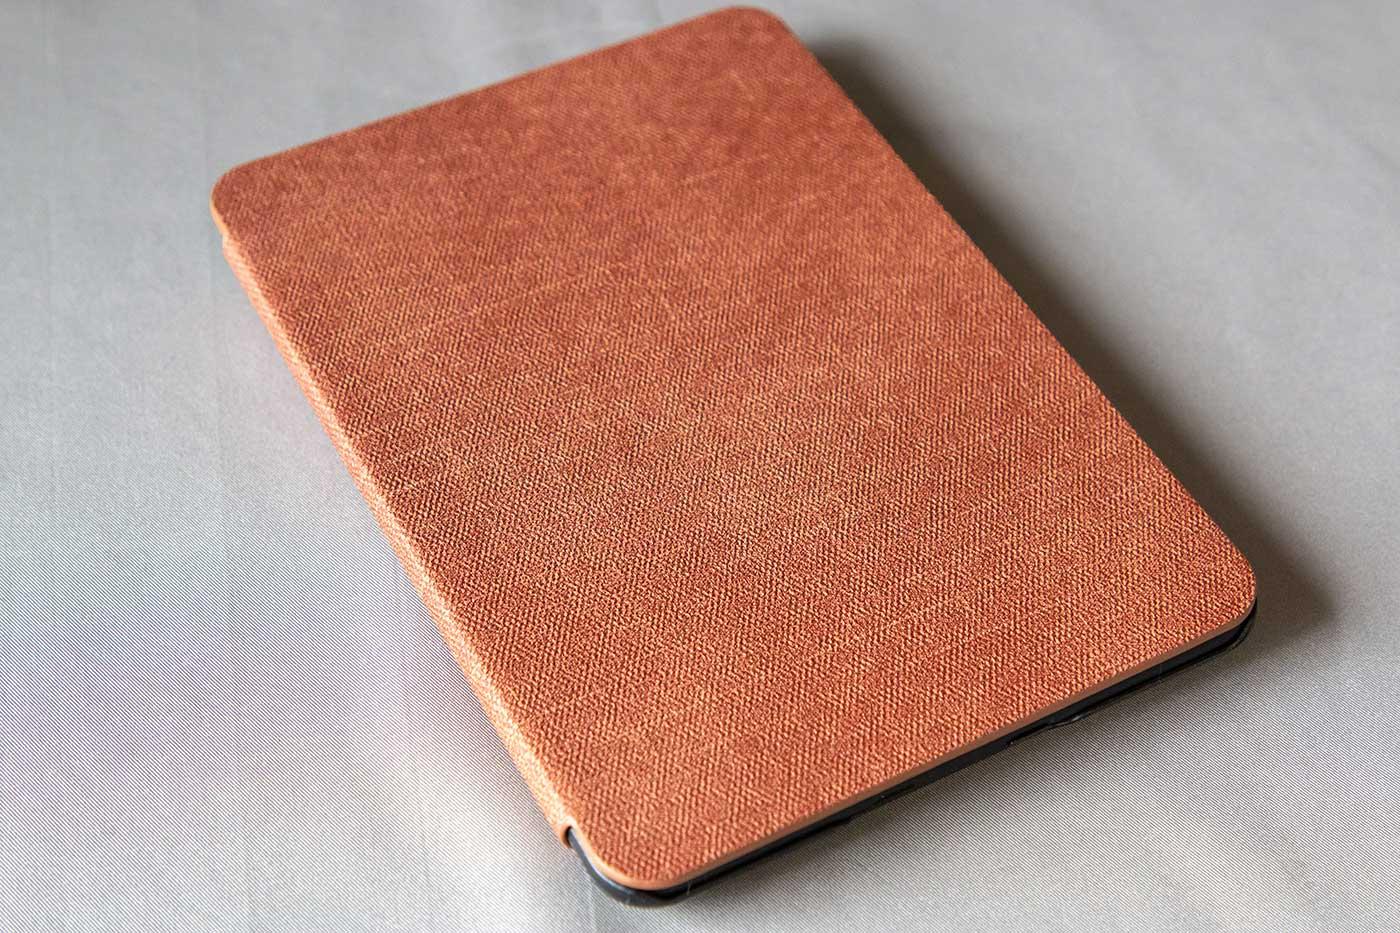 KindlePaperwhiteの非純正カバーのブラウン